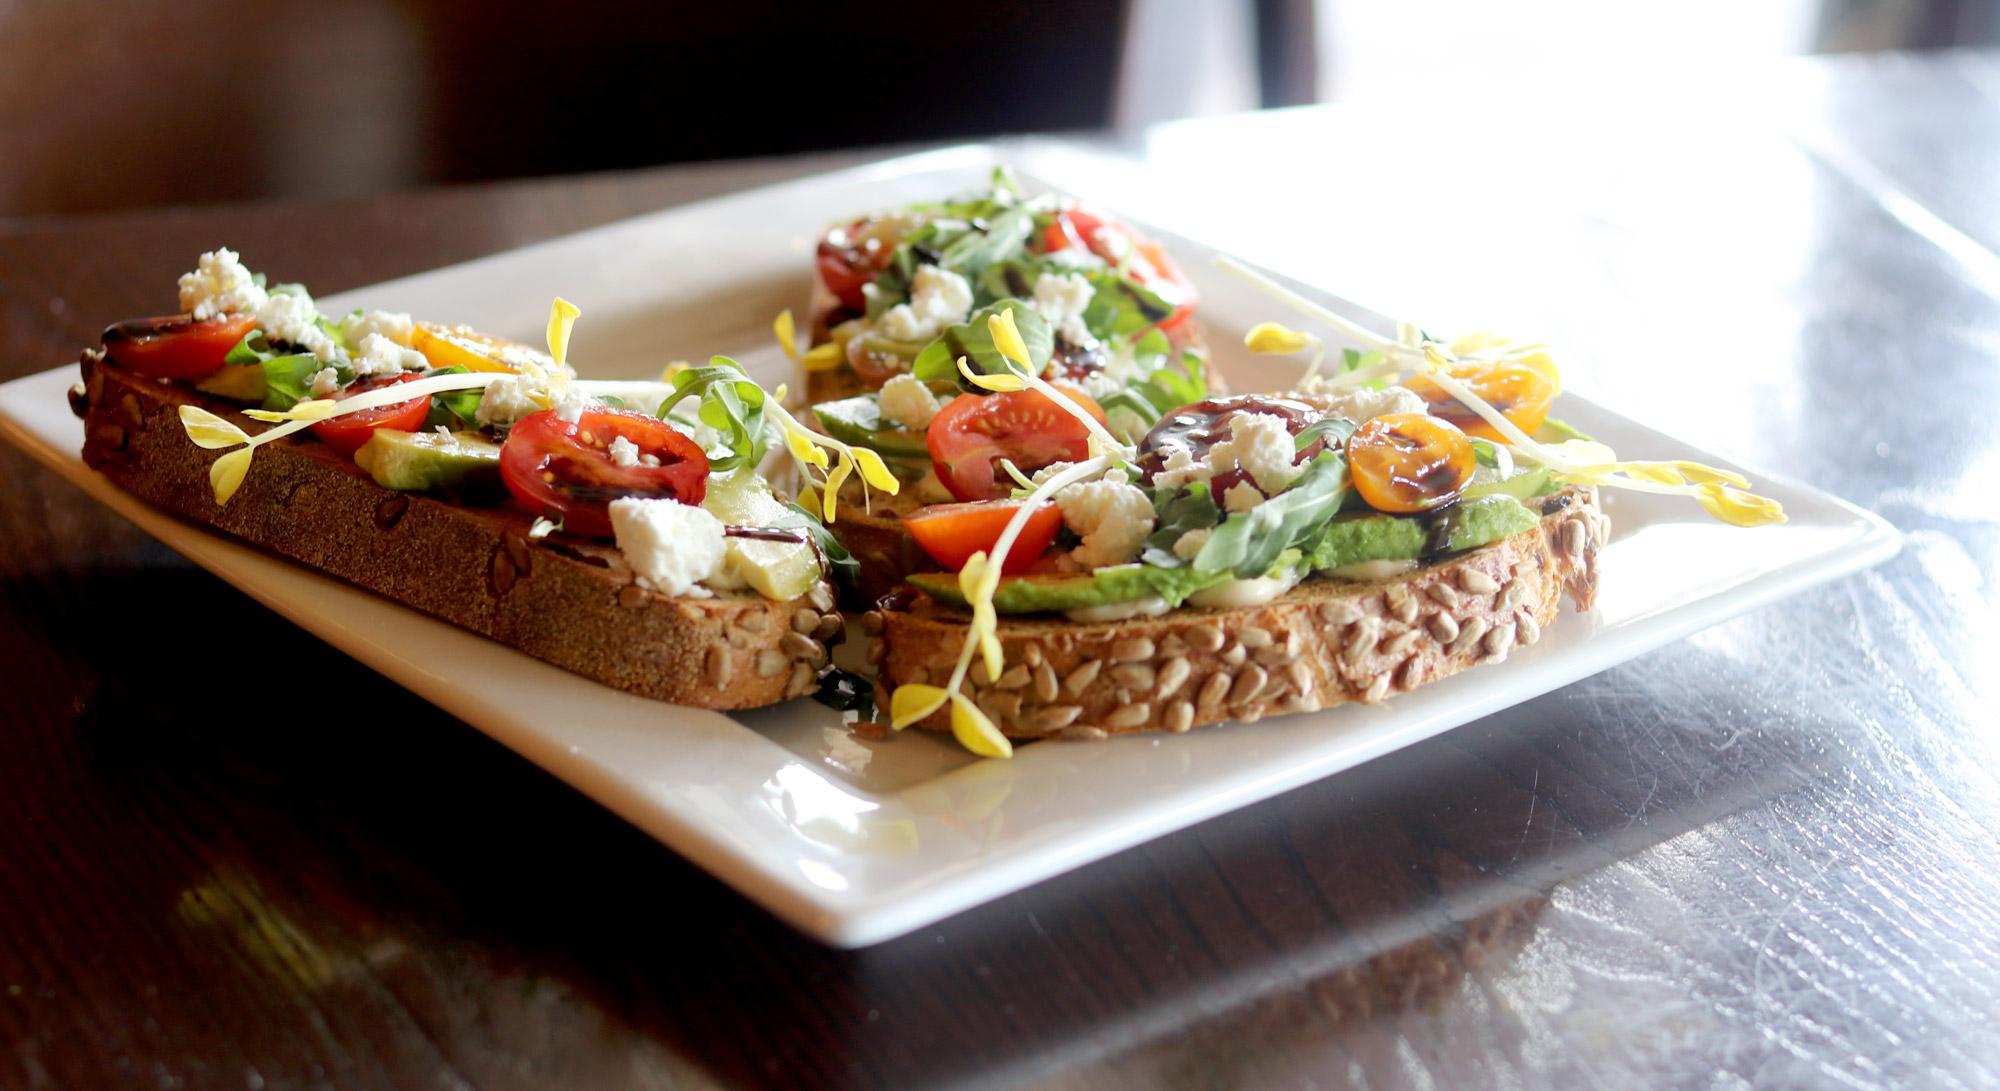 Avocado Toast | Avocado, Sangria Tomatoes, Arugula, Goat Cheese, Balsamic Glaze, Artisan Cranberry Bread